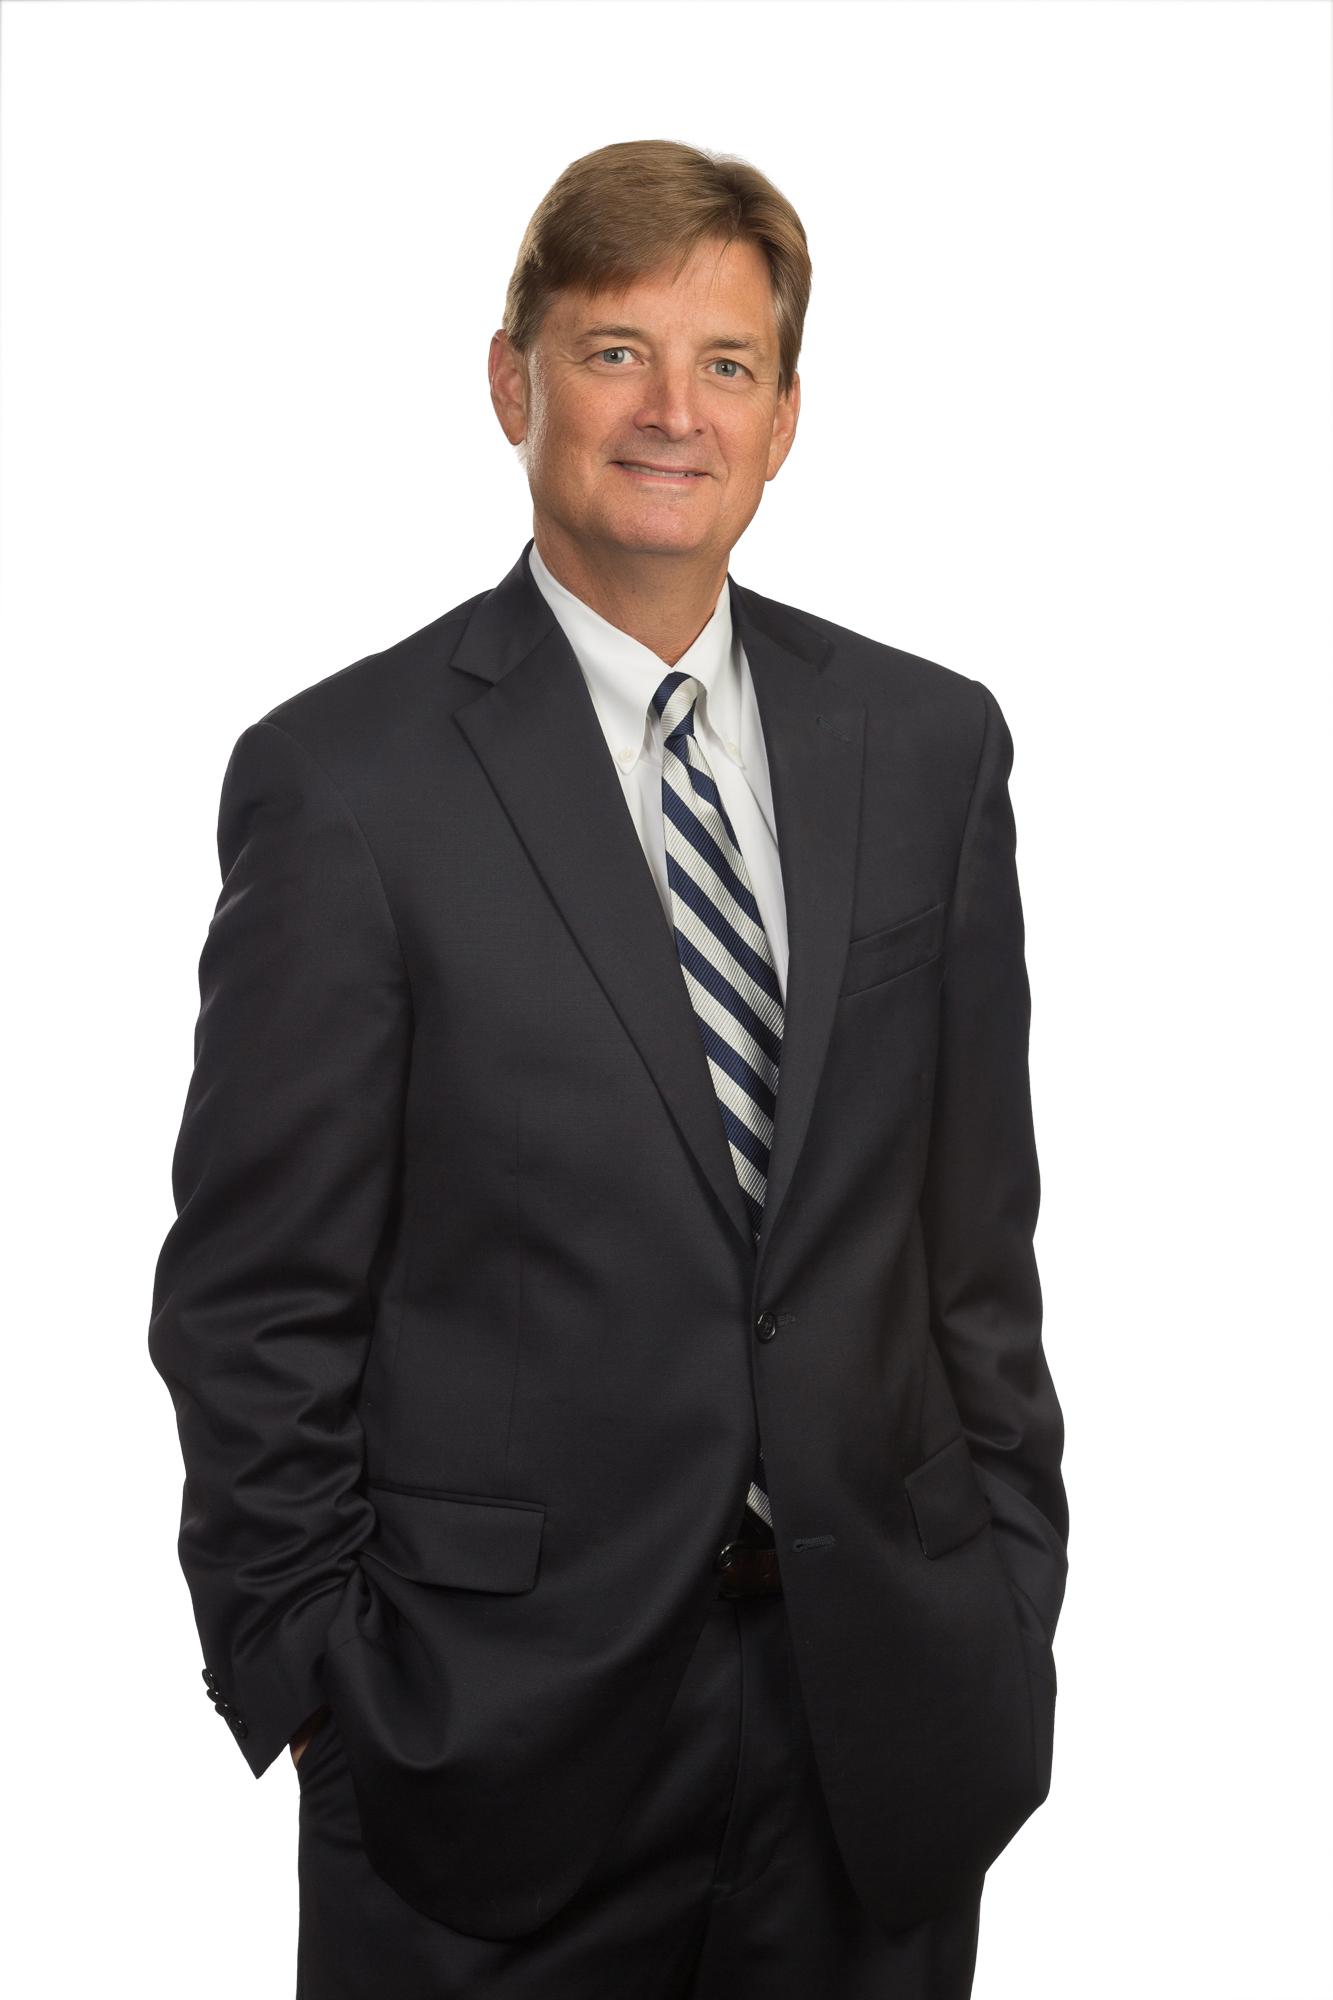 Corporate-Headshots-Lawfirm-Jacksonville.jpg